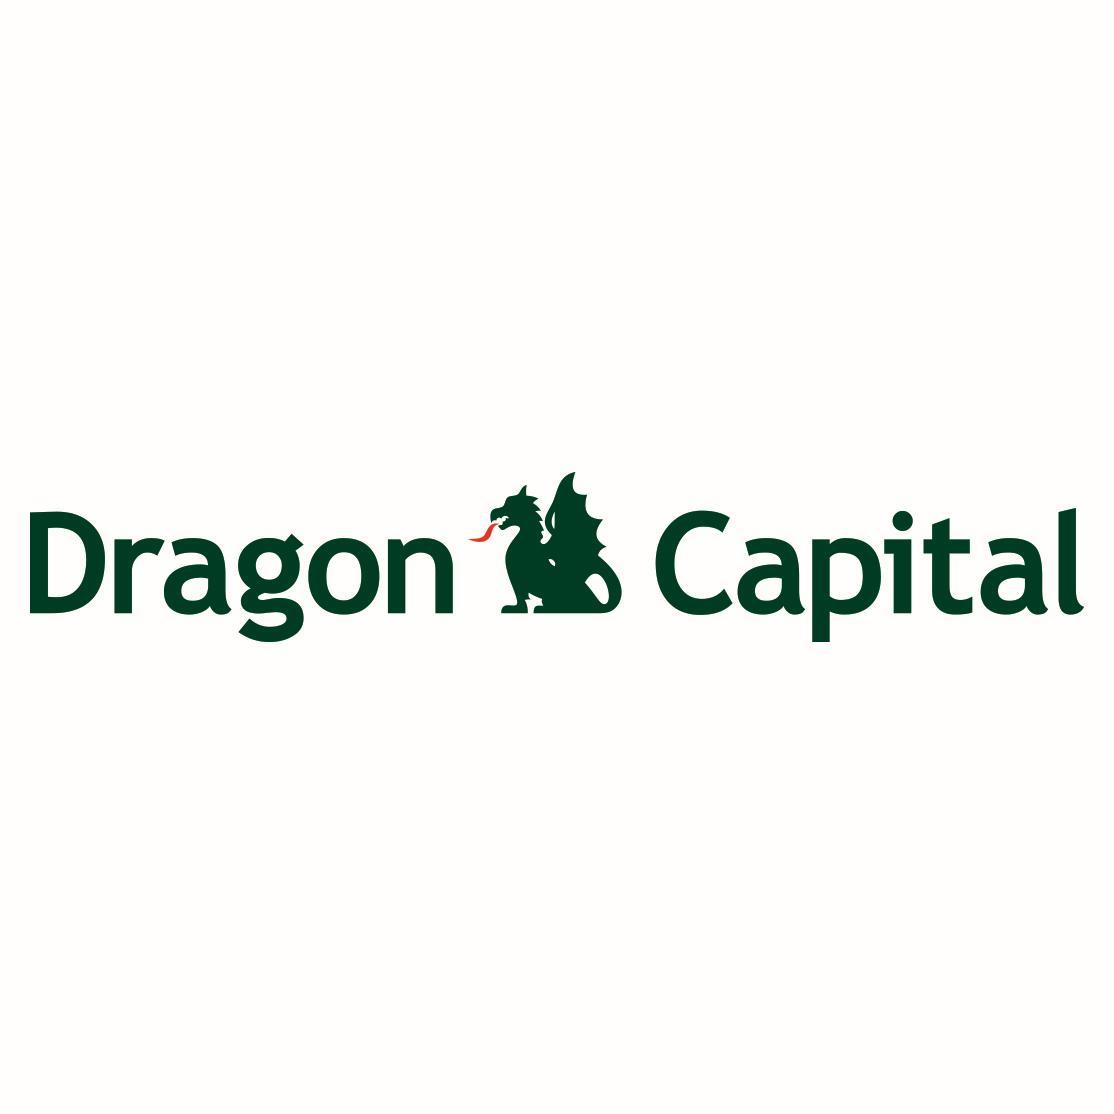 Dragon Capital